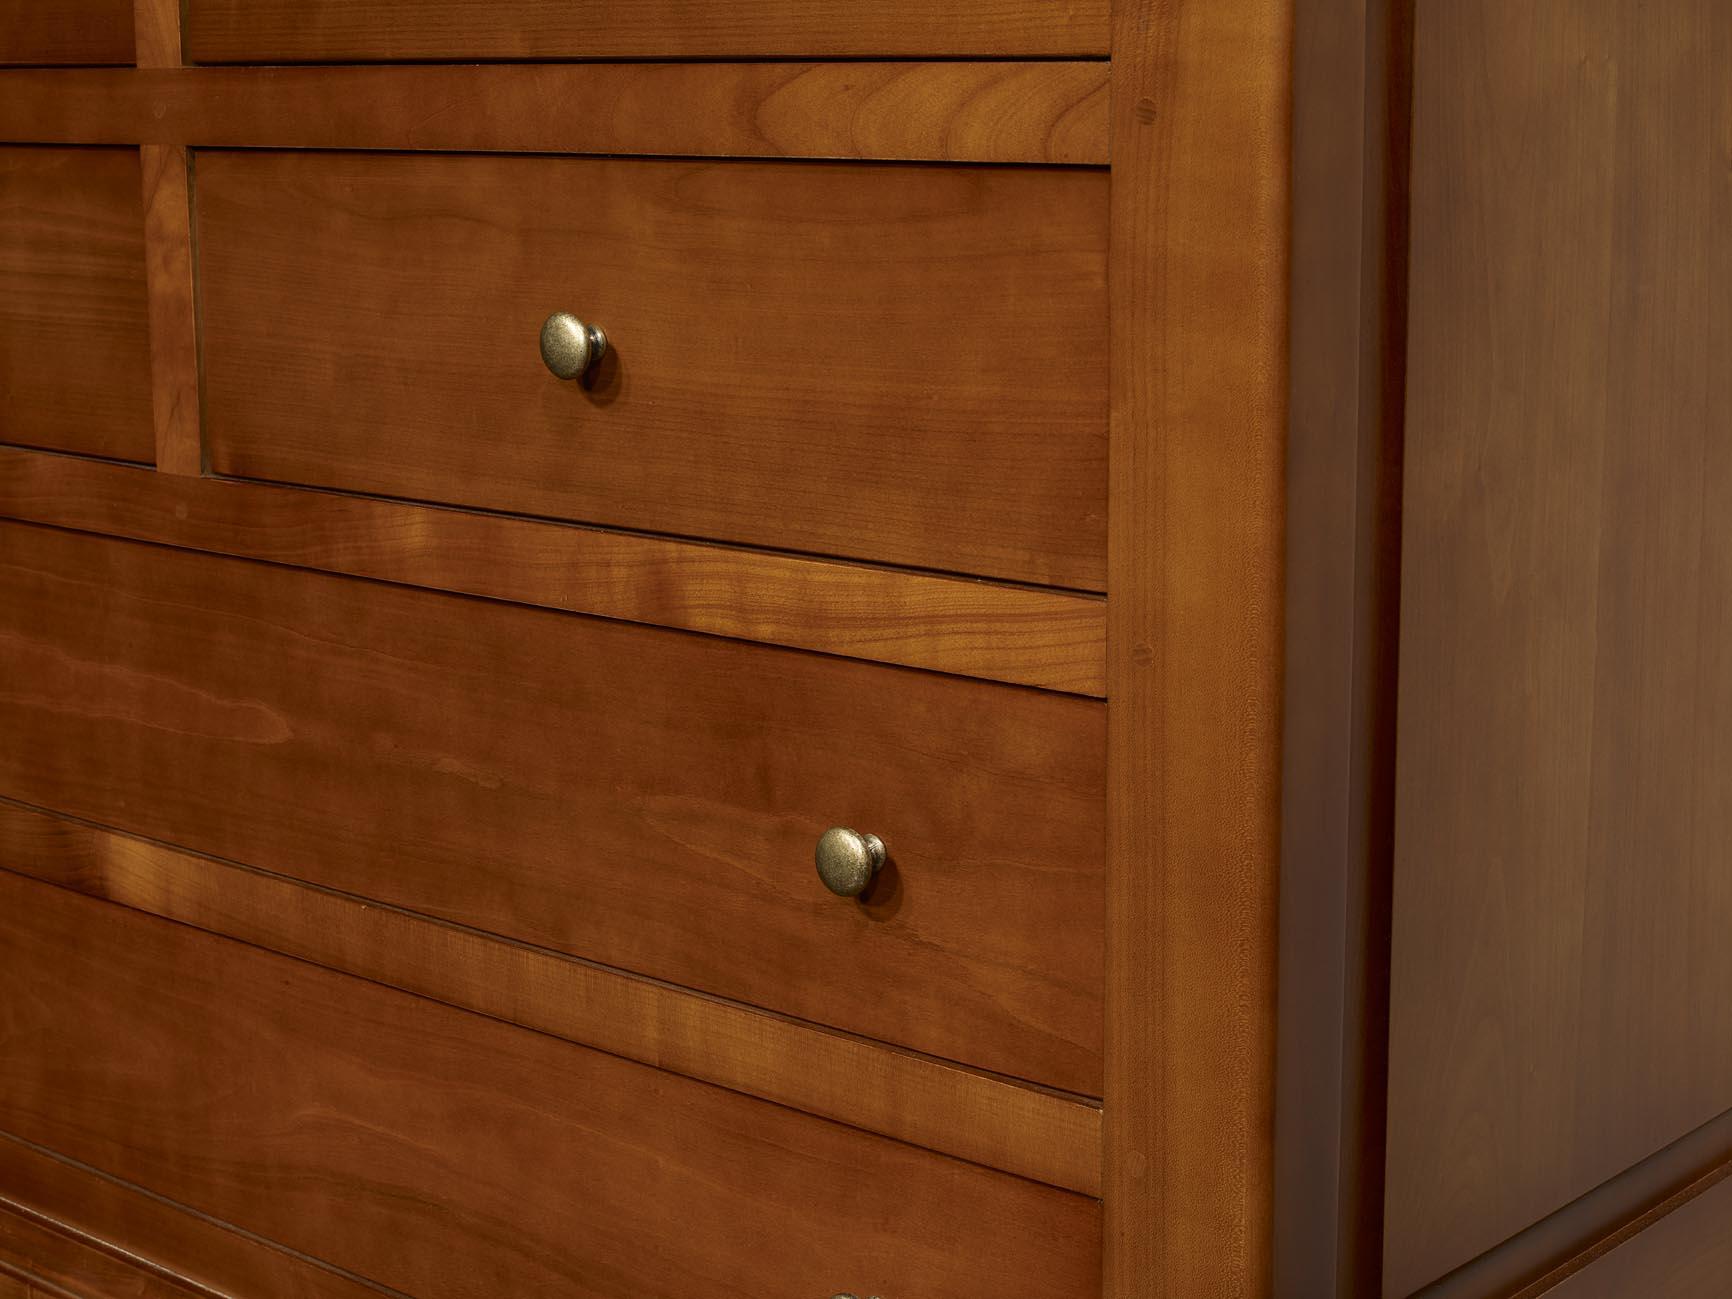 commode 7 tiroirs marie ralise en merisier massif de style louis philippe